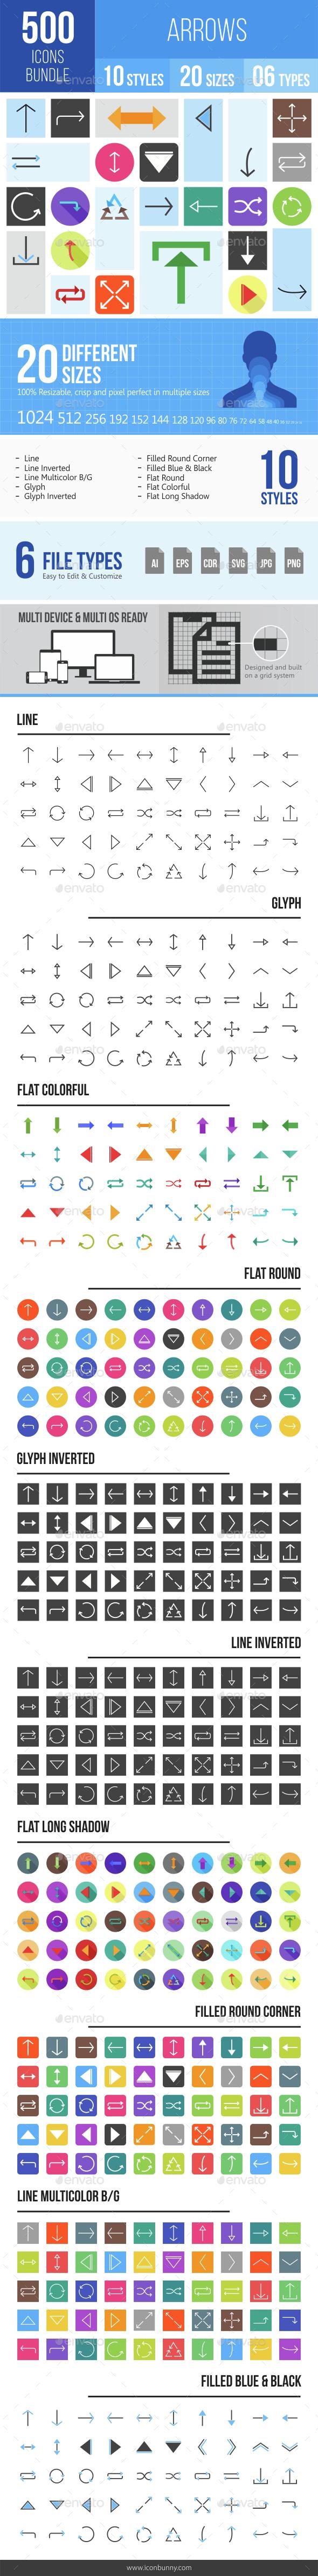 500 Arrows Icons Bundle - Icons